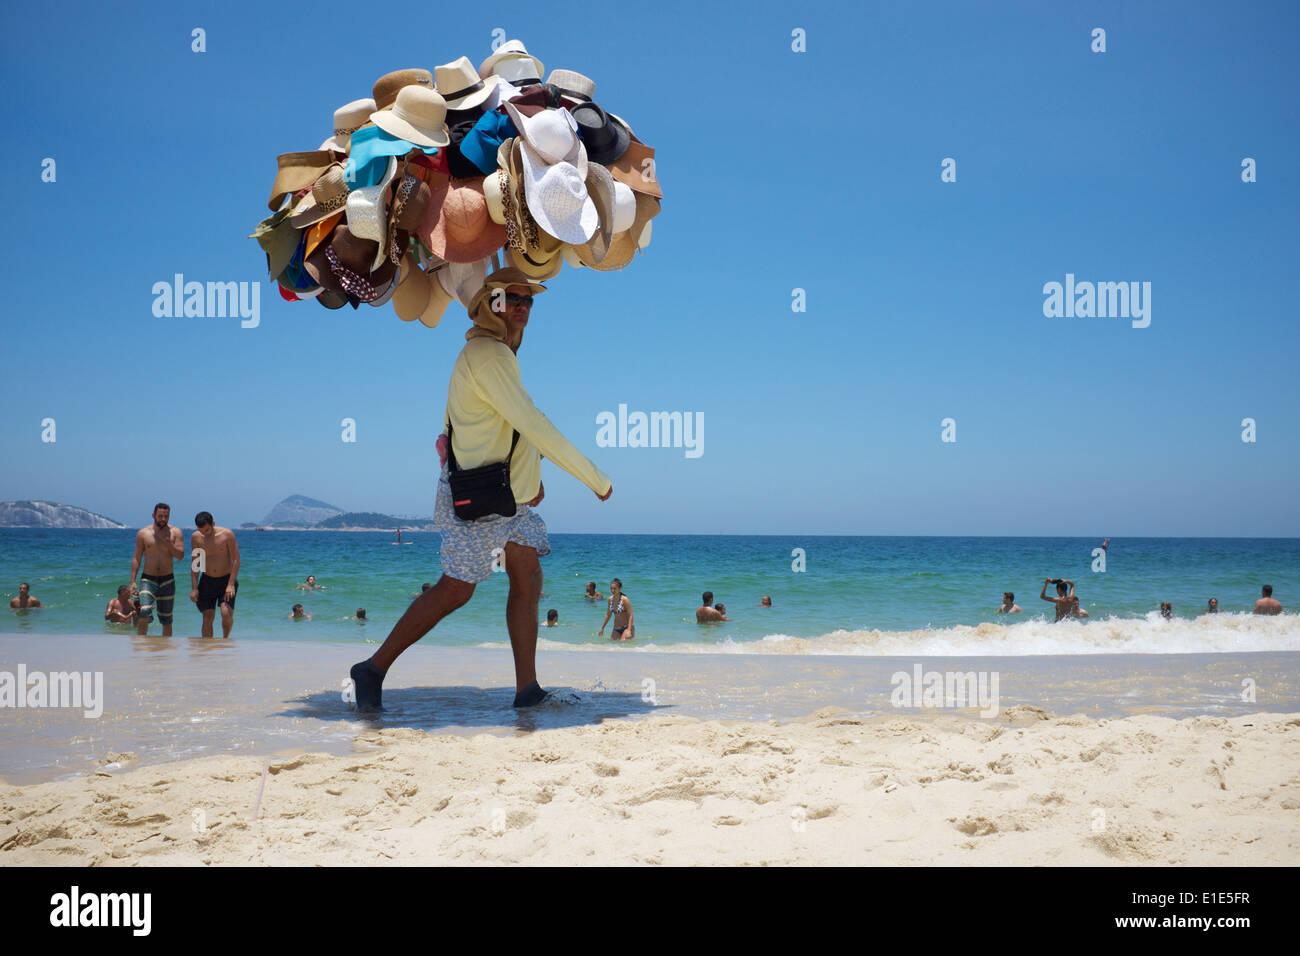 RIO DE JANEIRO, BRAZIL - JANUARY 22, 2014: Beach vendor selling hats walks carrying his merchandise on Ipanema Beach. - Stock Image